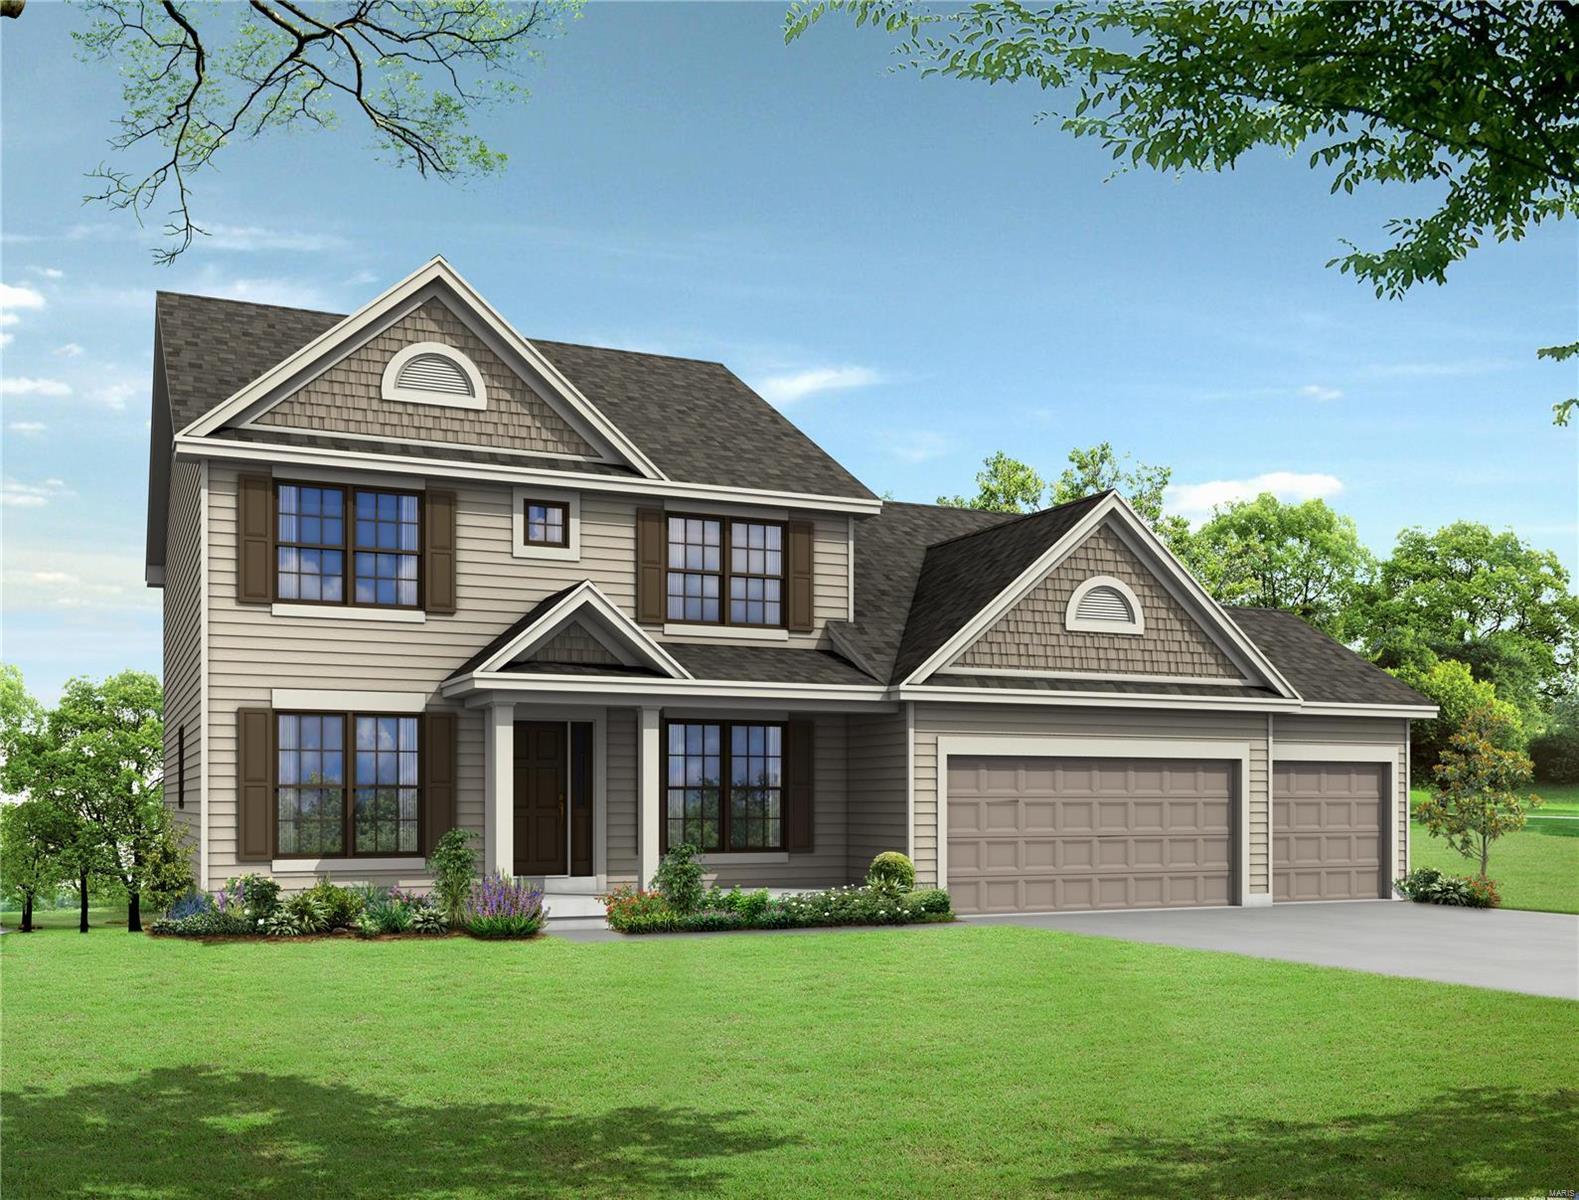 2 Liberty Model / Summit Estates Property Photo - Fenton, MO real estate listing